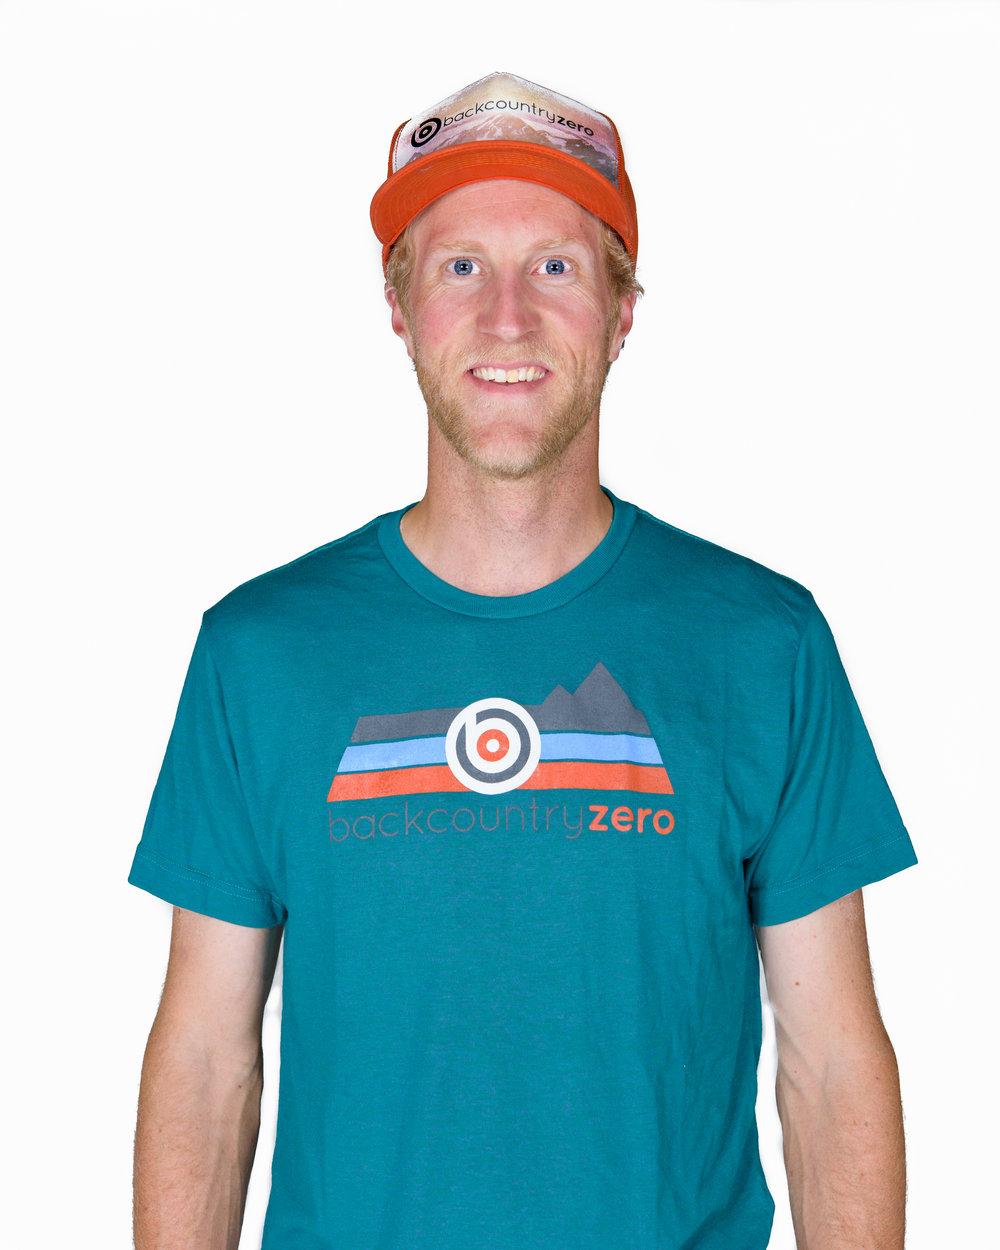 Backcountry Zero athletes-7921.JPG